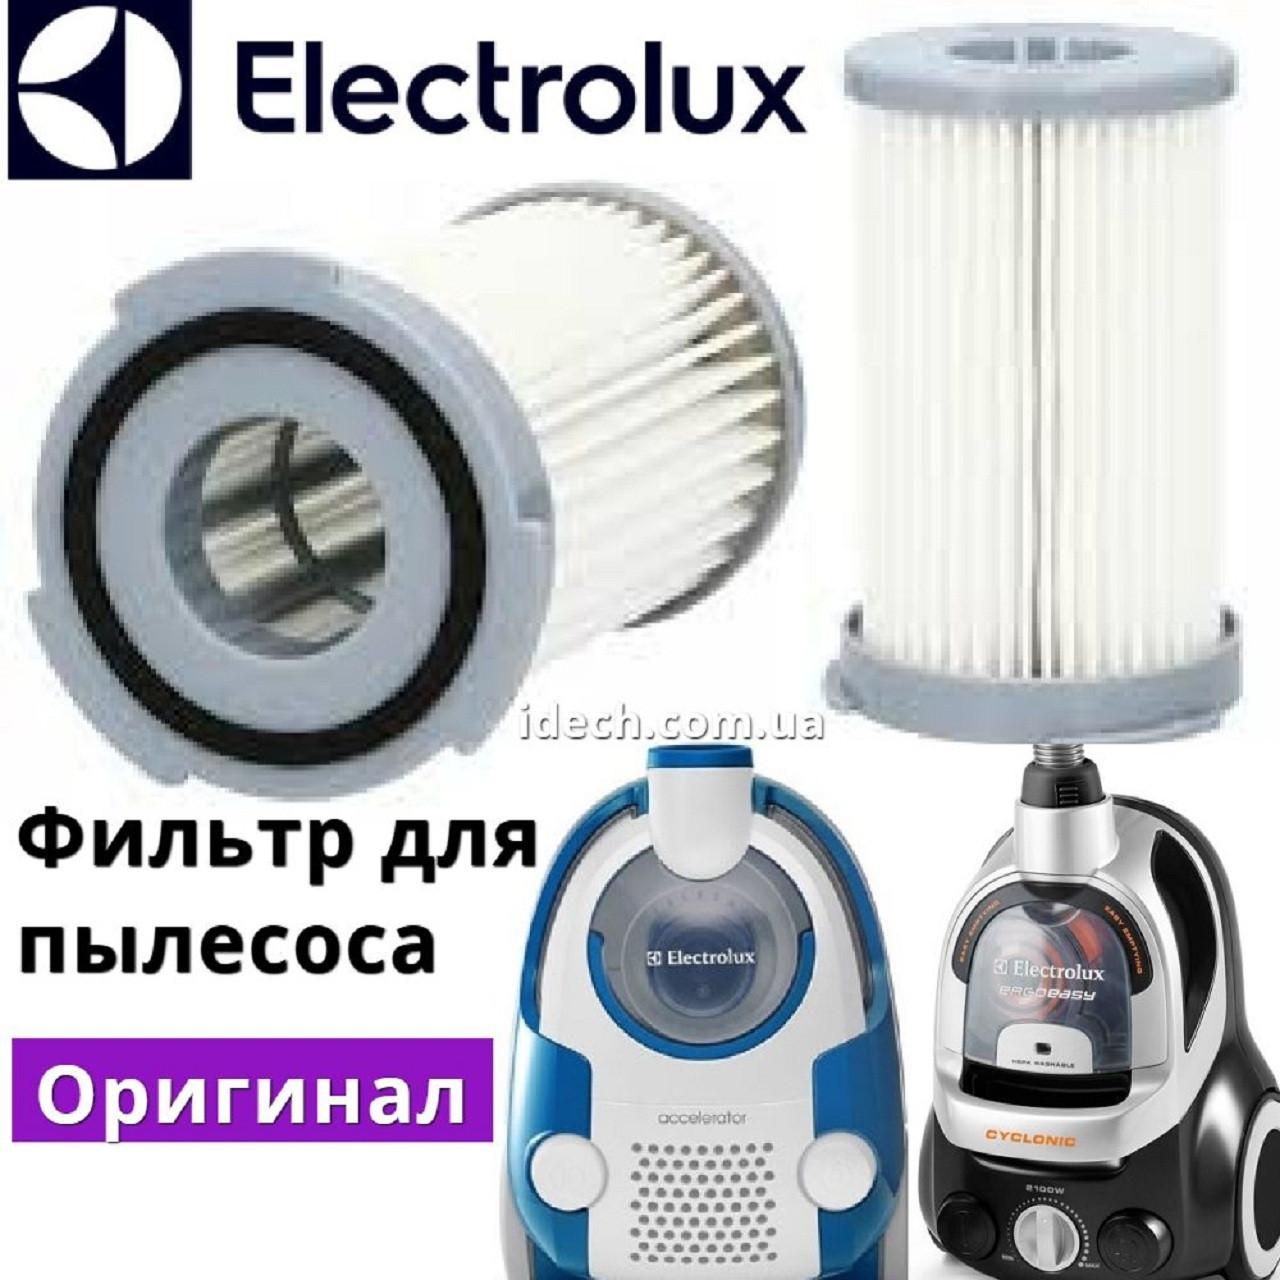 Electrolux Ergoeasy ZTF 7610, 7615, 7616, 7640, 7650 і Accelerator zac 6716 фільтр хепа на пилосос без мішка